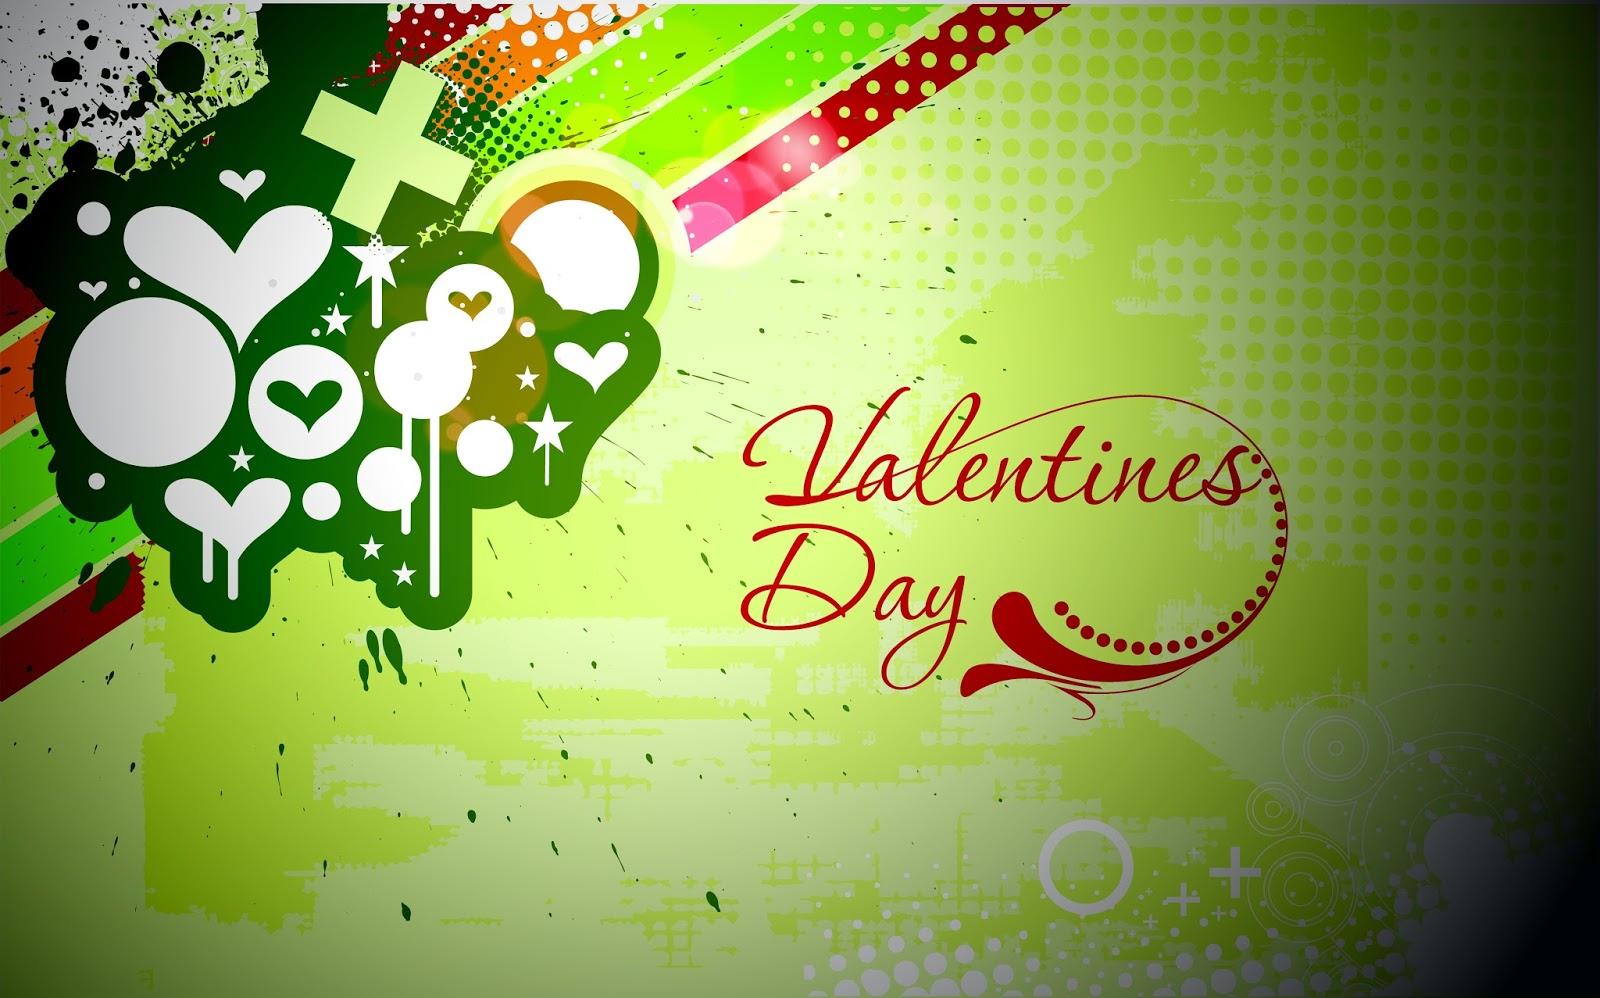 Fondos De Pantalla Gratis San Valentin 16: Imagenes Y Wallpapers: Fondo De Pantalla Dia De San Valentin